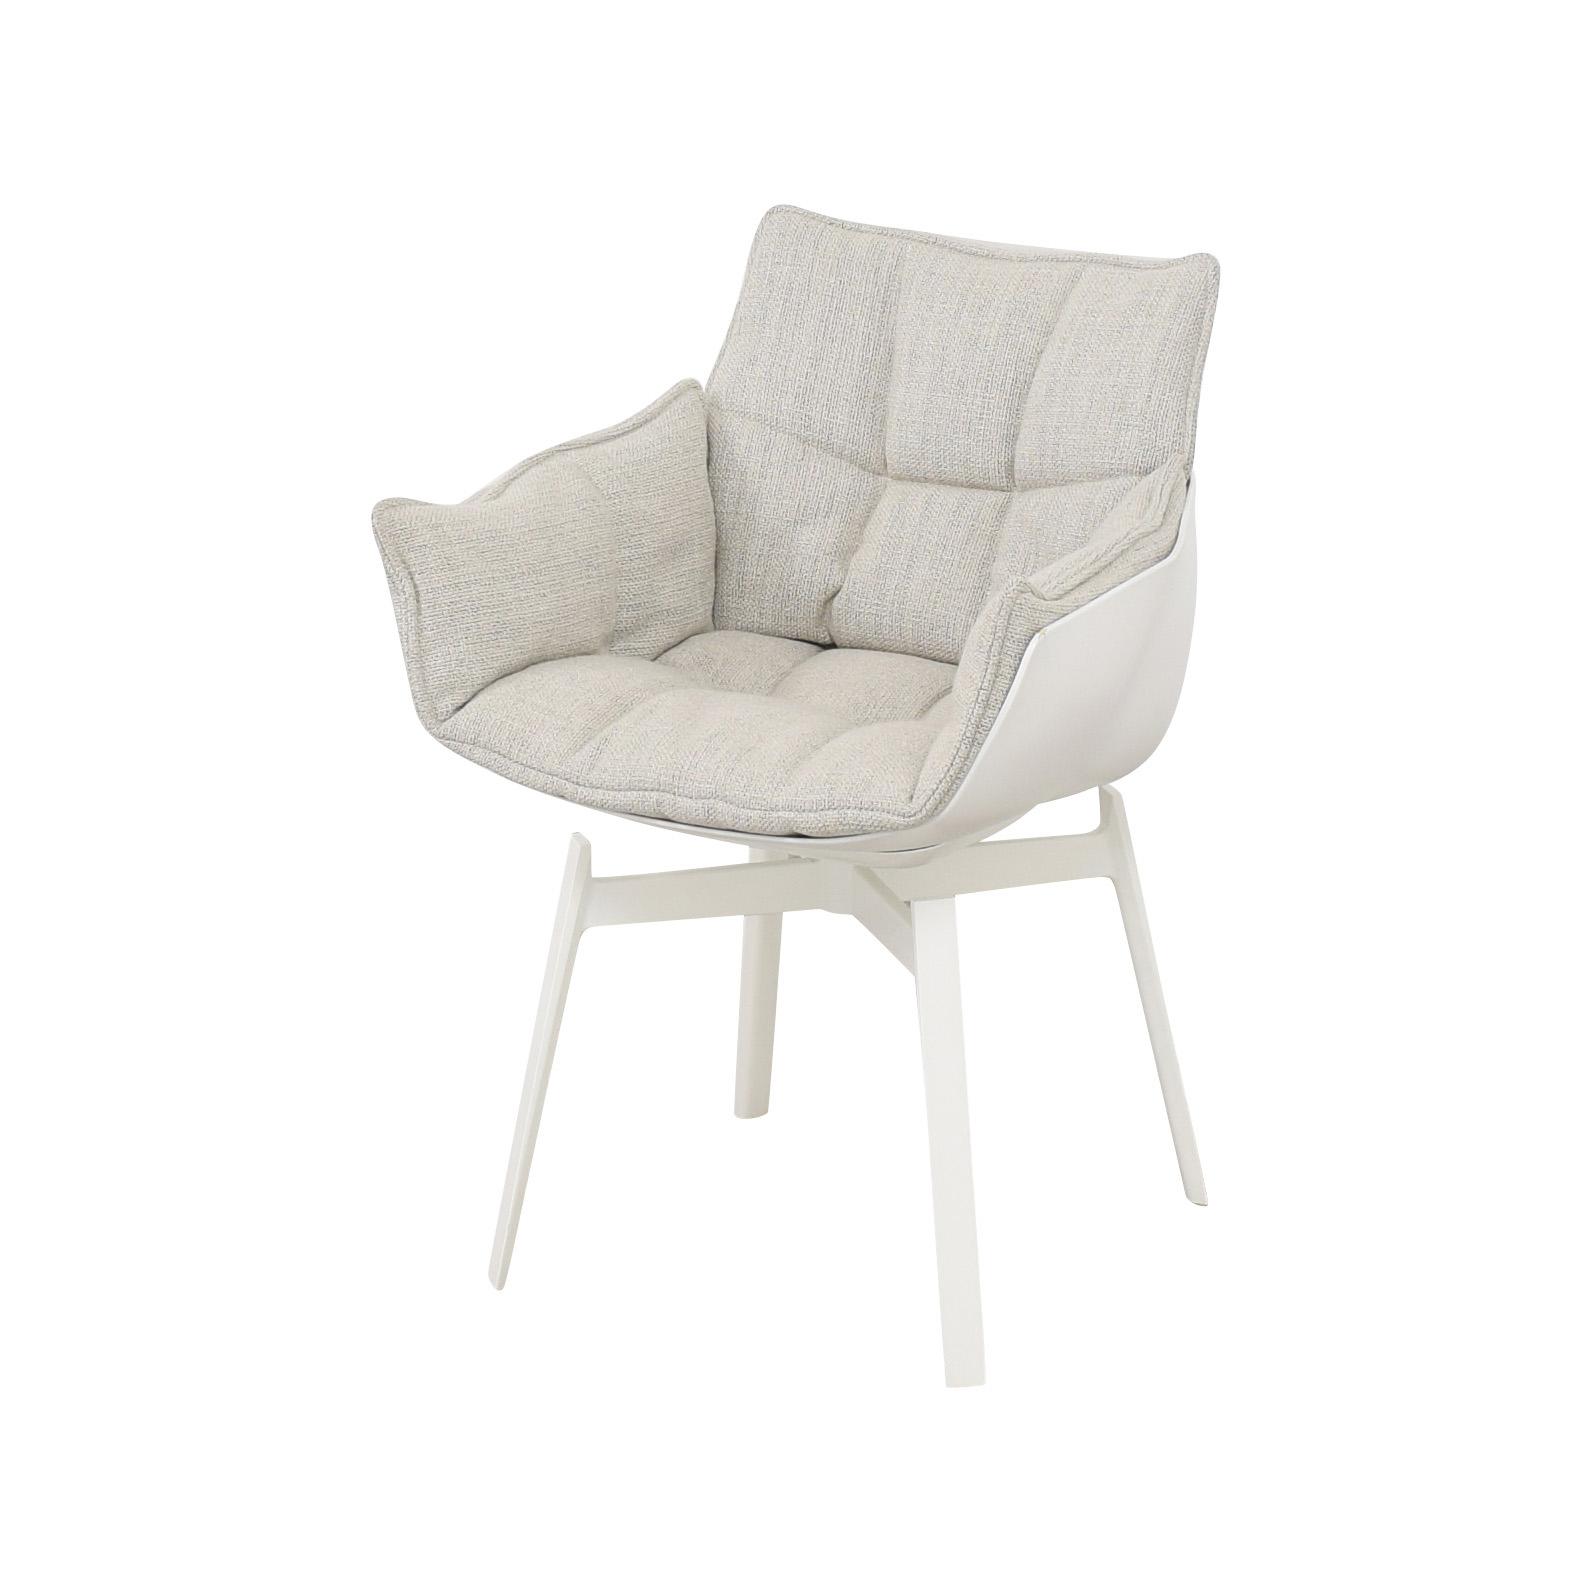 buy B&B Italia Husk Chair B&B Italia Chairs